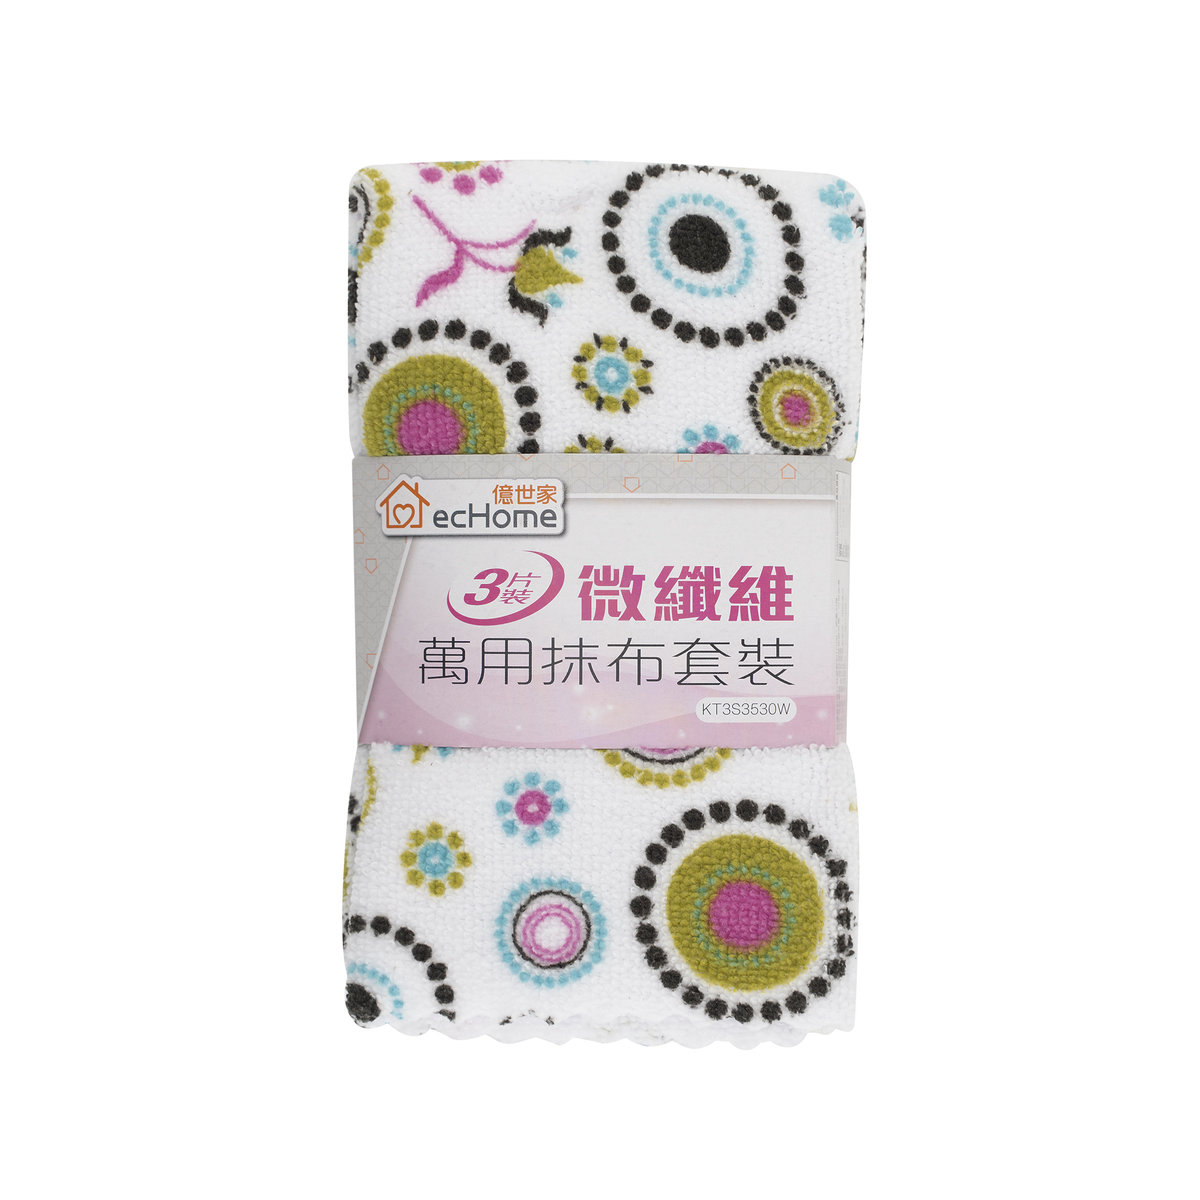 Microfiber Cleaning Towel Set - KT3S3530W